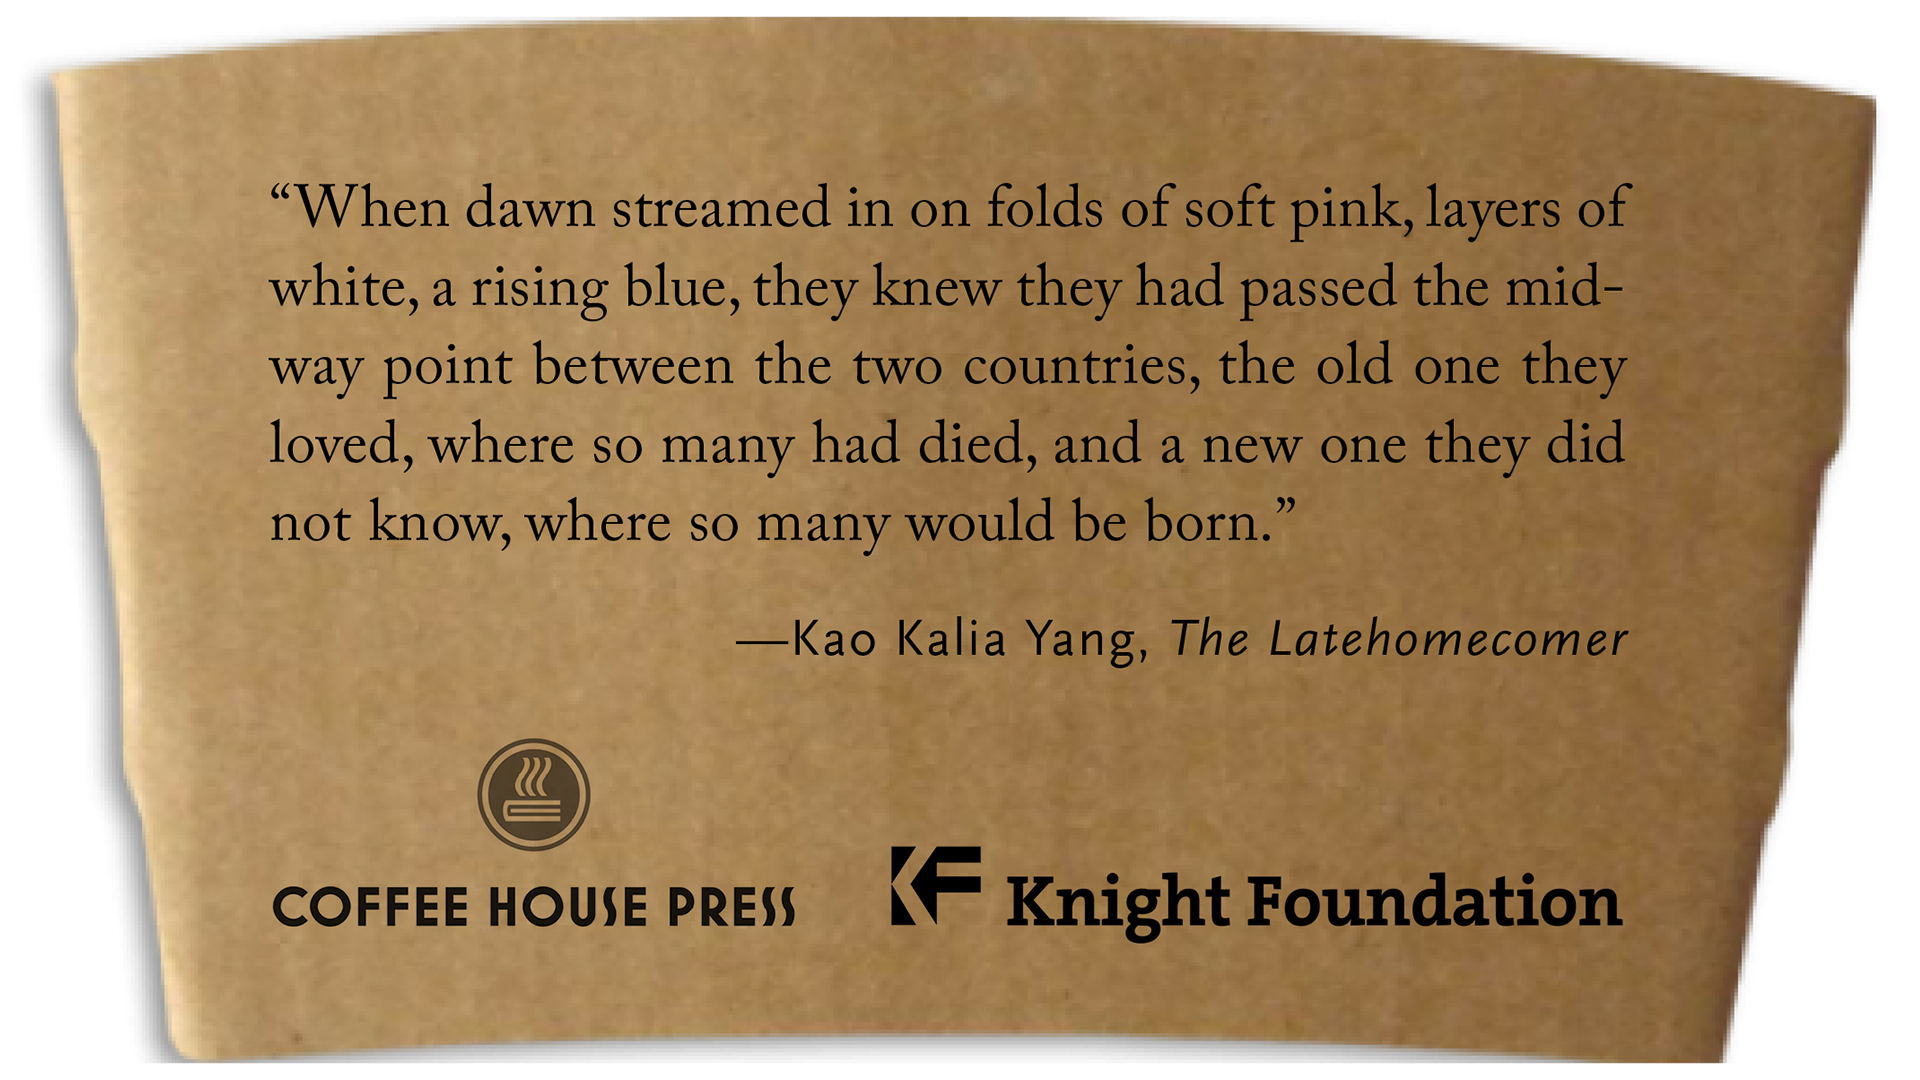 KnightCoffeeSleeve1920x1080_1.jpg